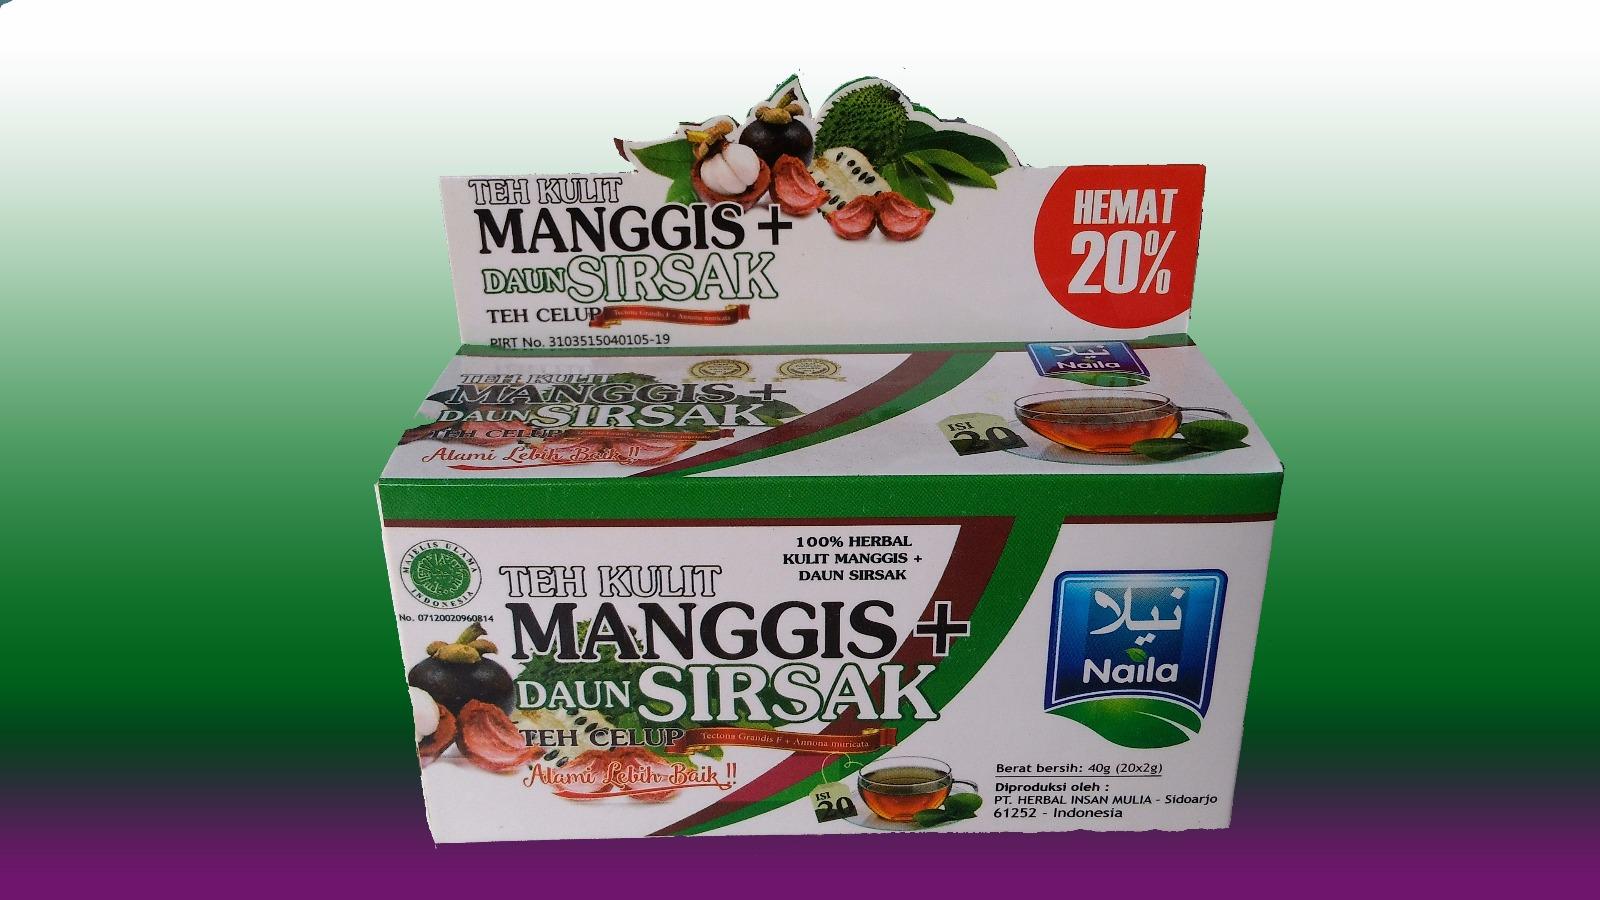 Harga Dan Spesifikasi Teh Kulit Mangis Terbaru 2018 Herbal Daun Sirsak Kemasan 1 Box 25 Celup Jual Naila Tea Dari Ekstrak Manggis Cak Duki Store